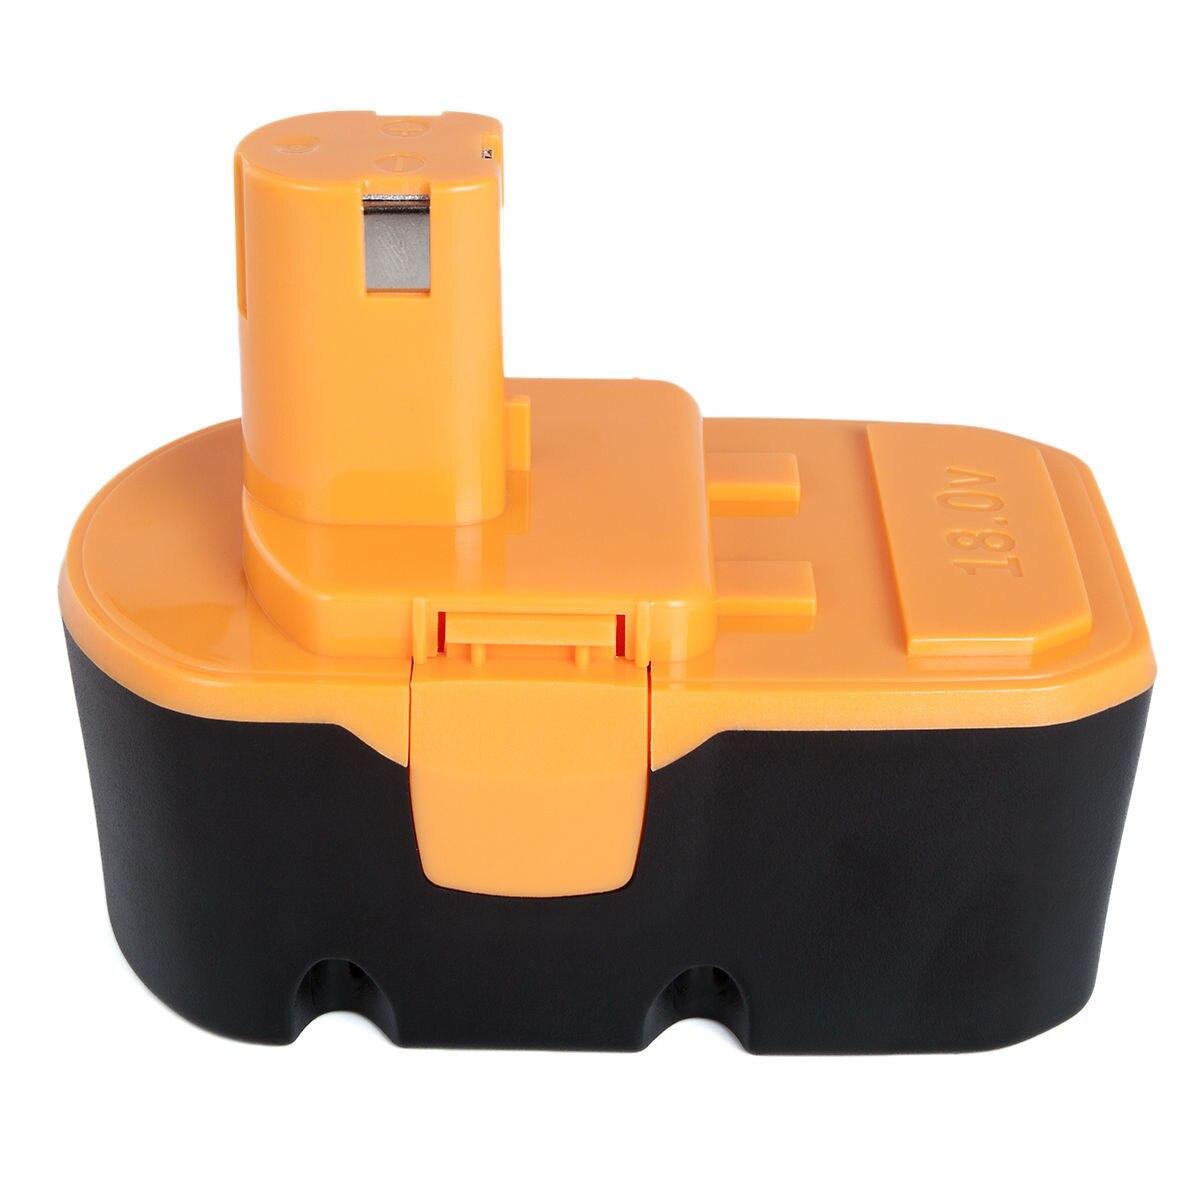 2 шт. для Ryobi P100 Замена ноутбука Батарея 3000 мАч аккумуляторная Powertools Батарея для Ryobi P102 P103 P104 P105 P107 P108